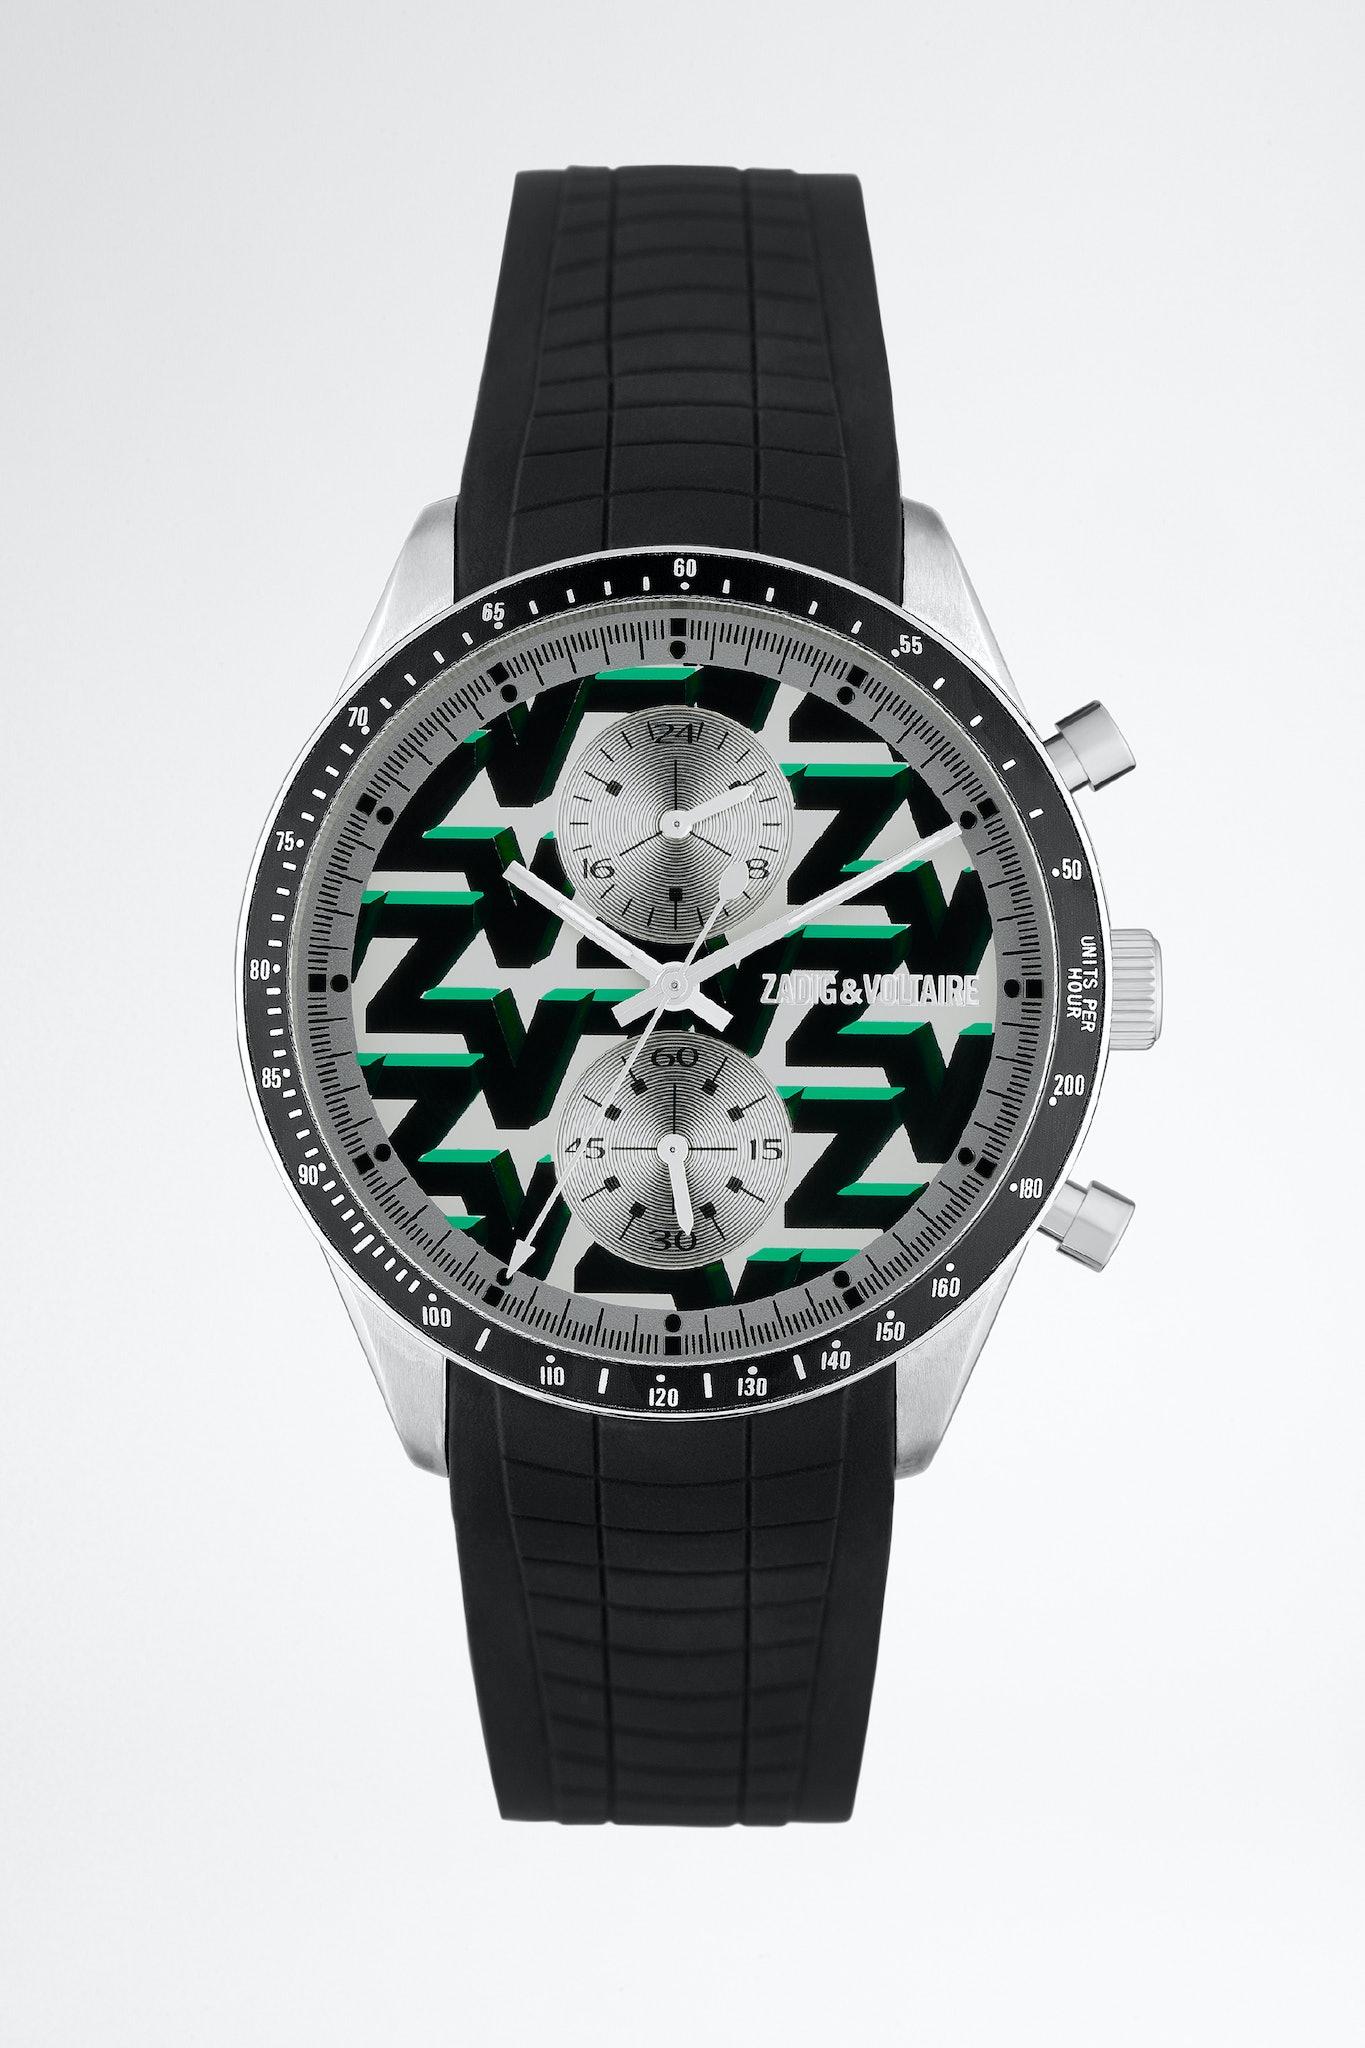 ZV monogram Master chrono watch